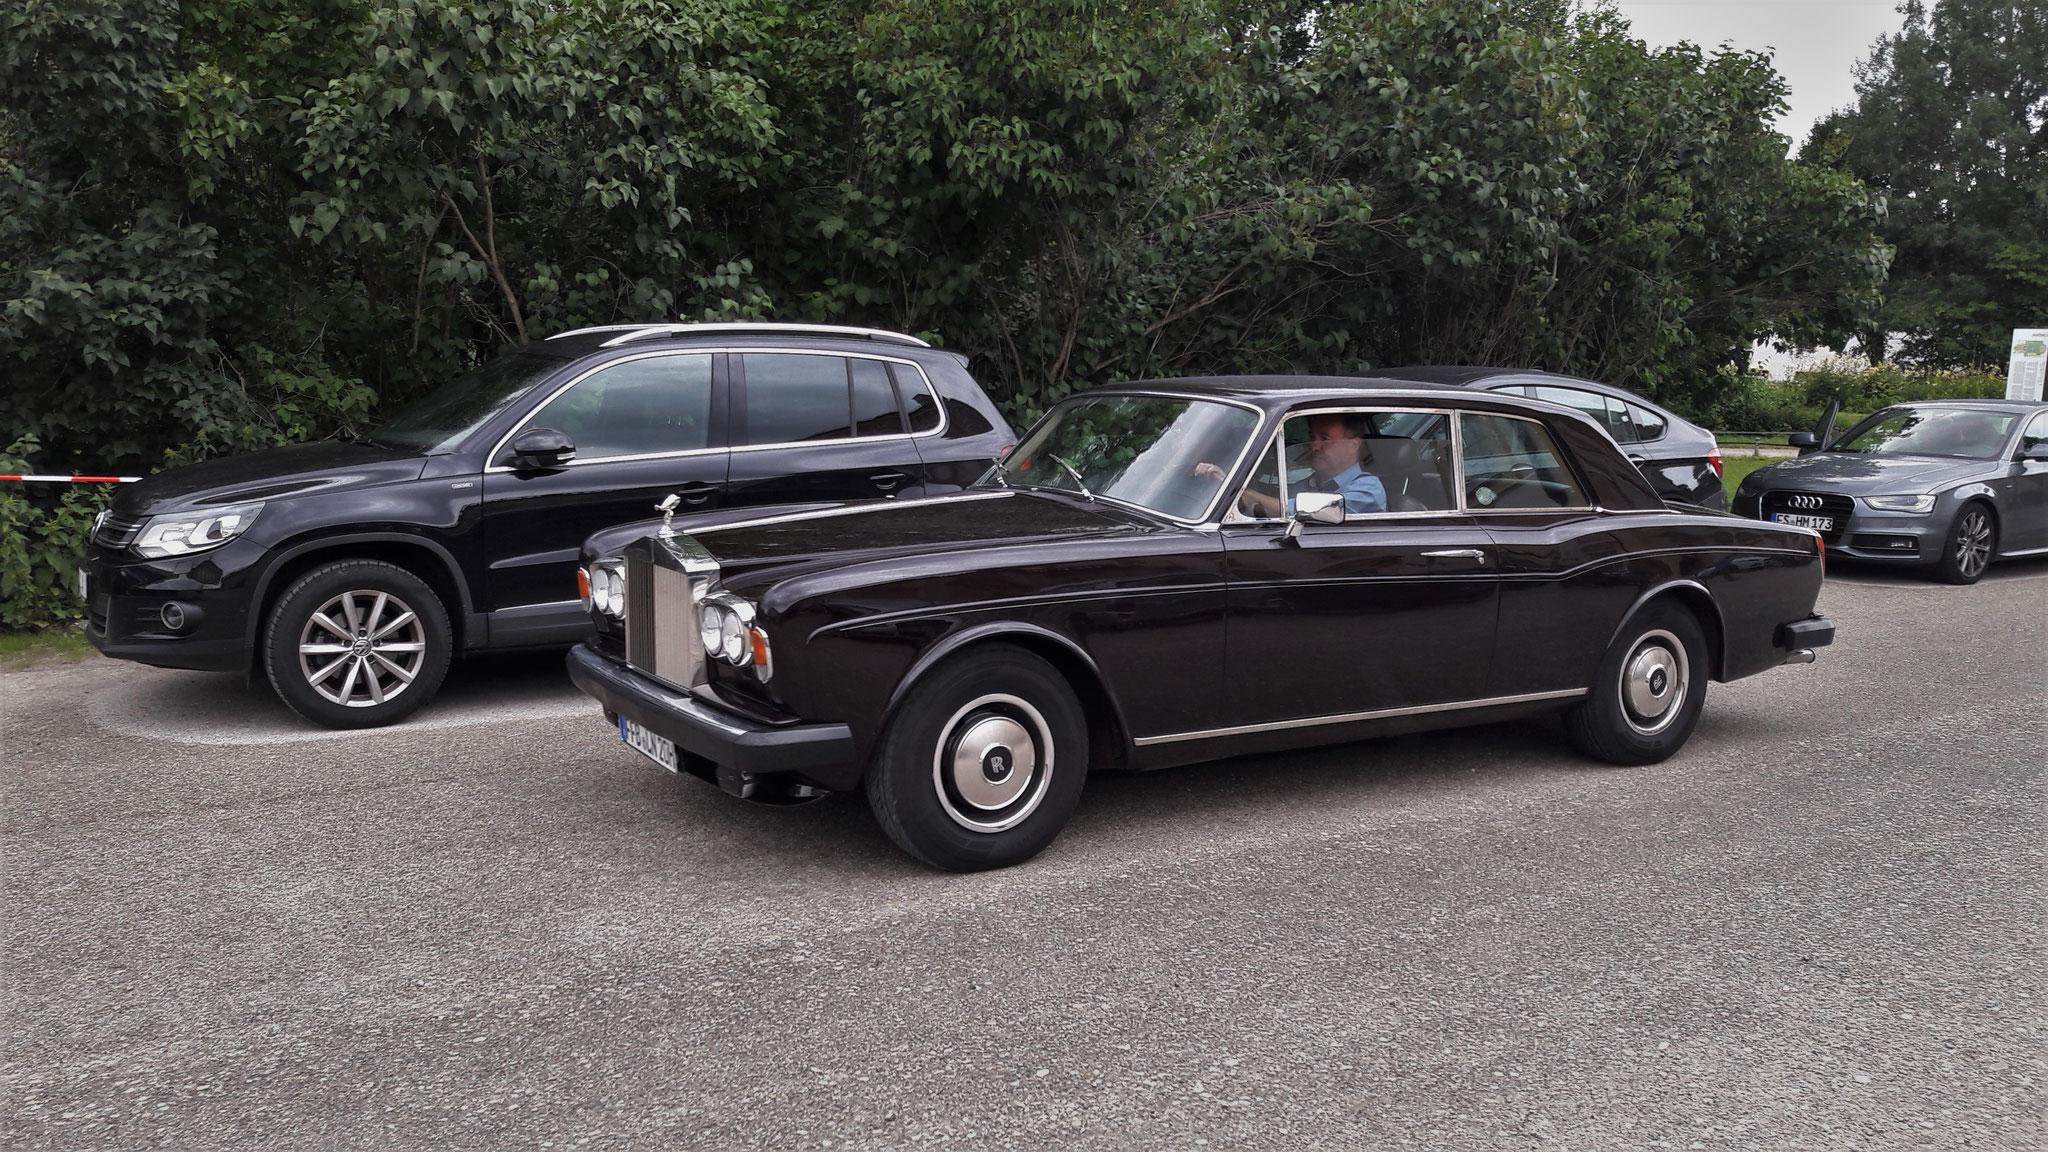 Rolls Royce Corniche - FFB-LN-20H